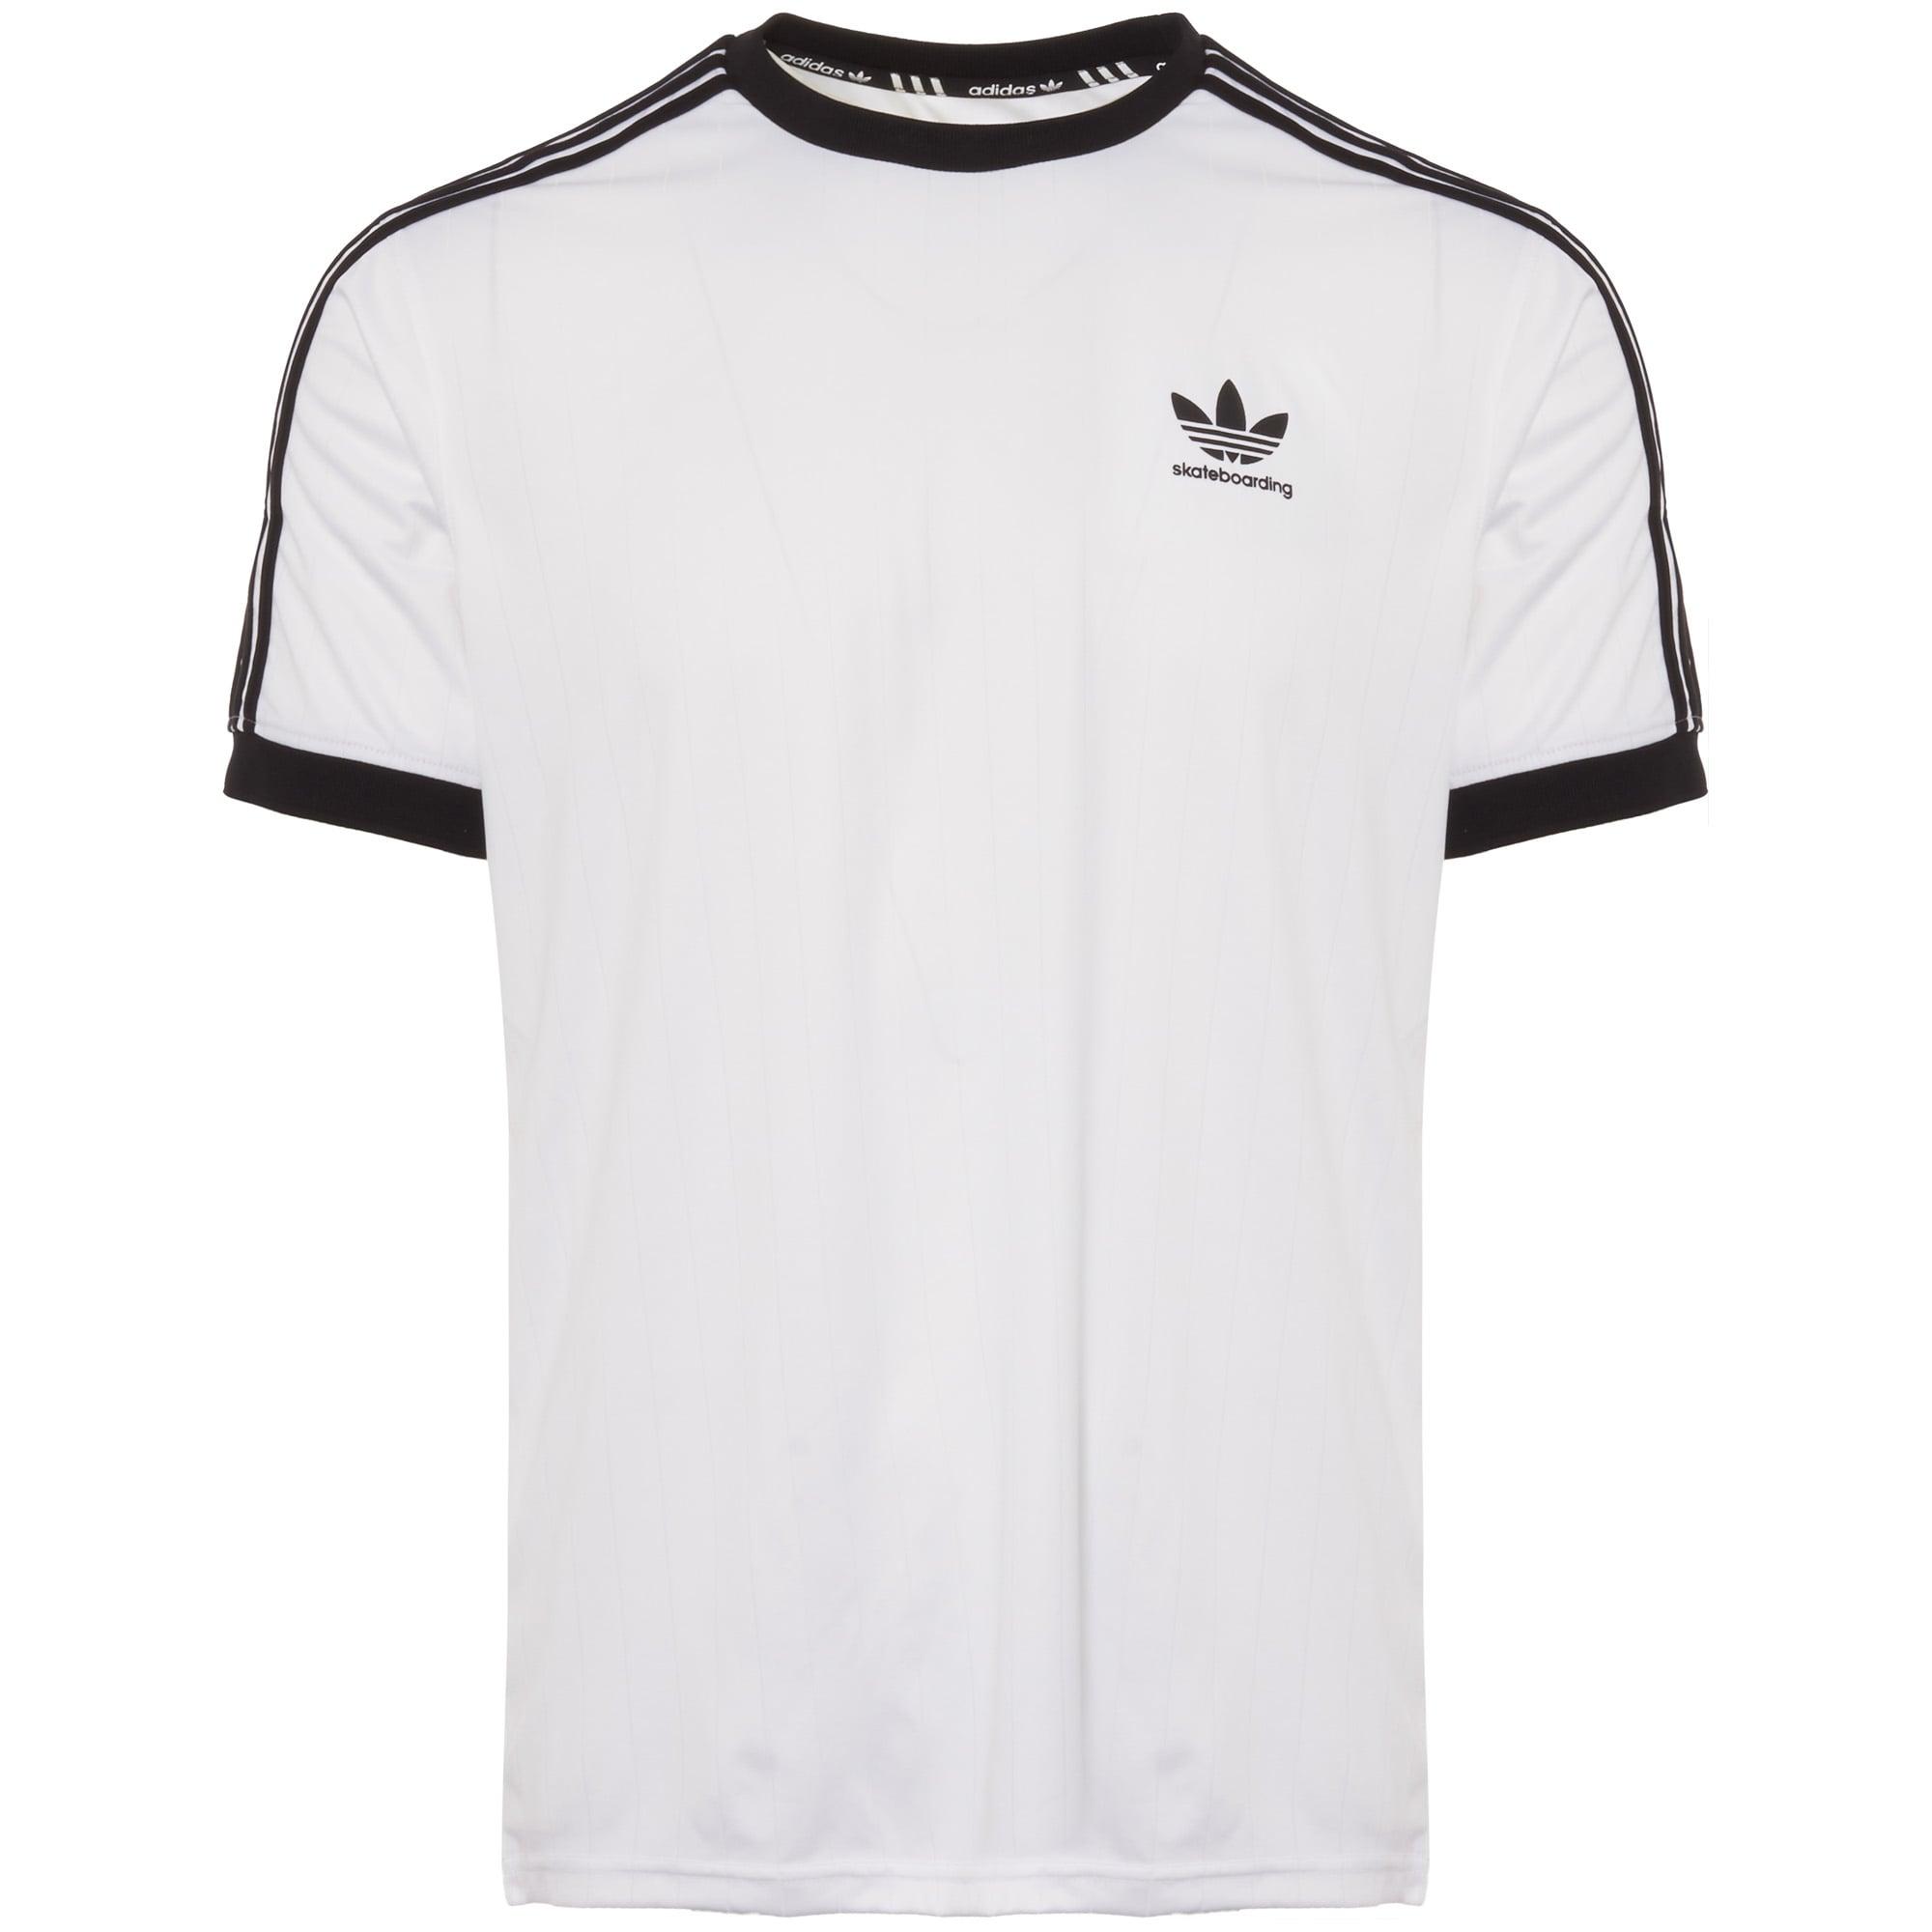 c1eaaccb5 Adidas White Clima Club Jersey CF5797 | Stuarts London